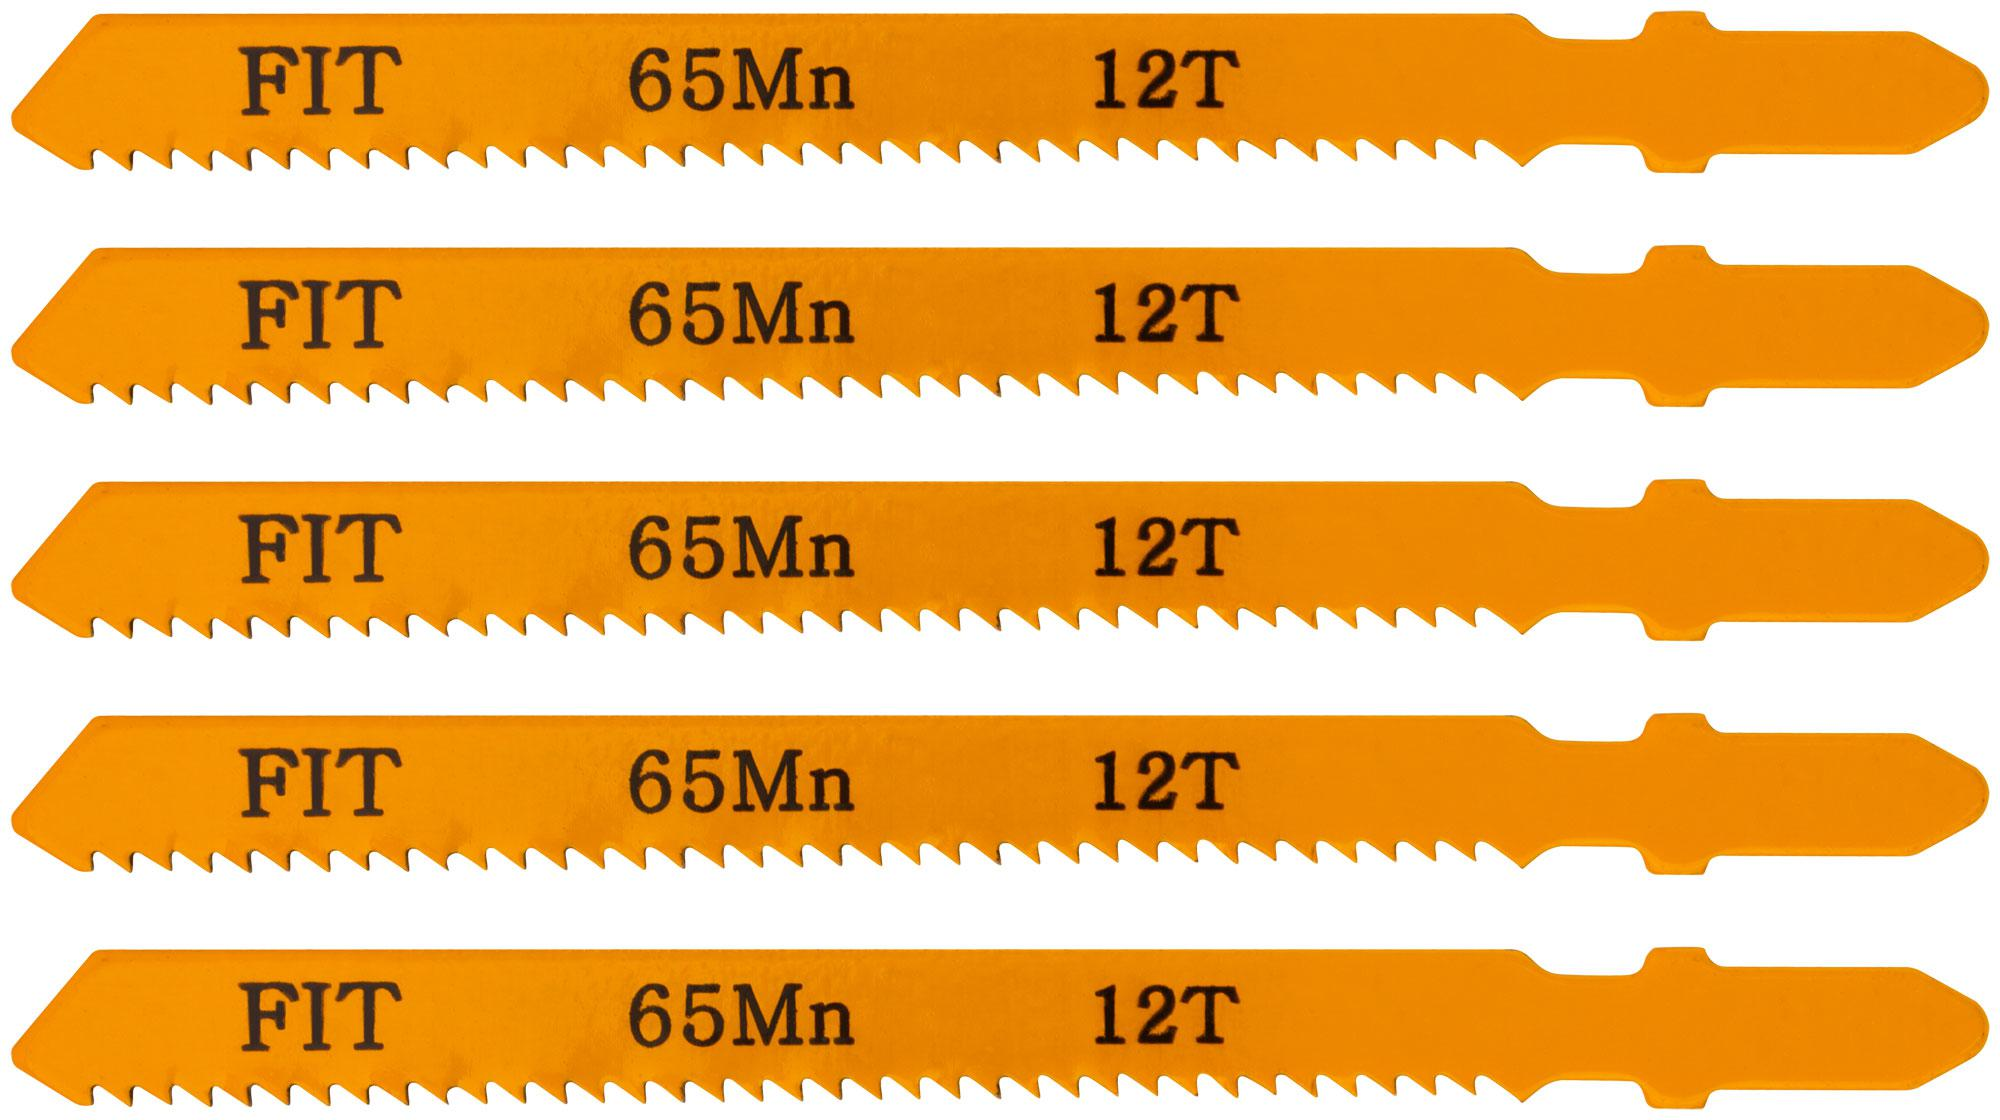 Пилки для лобзика Fit 41107 пилки для лобзика по дереву набор 5 шт стандарт